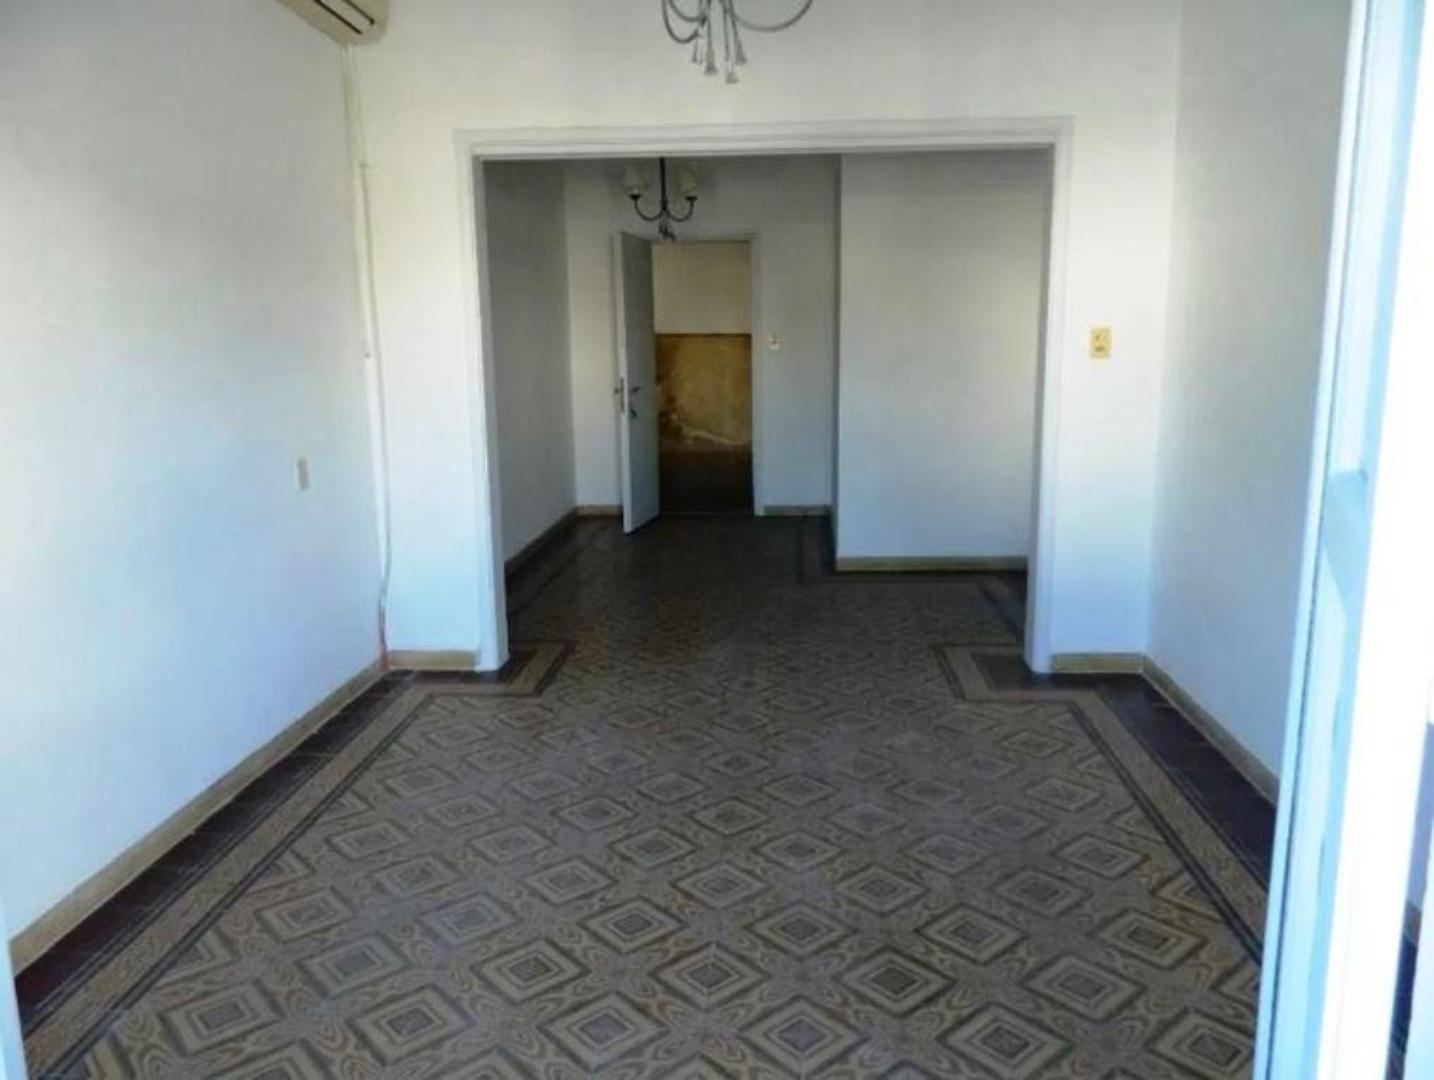 XINTEL(OTG-OTG-831) Departamento - Venta - Uruguay, Montevideo - EMILIO FRUGONI 1200